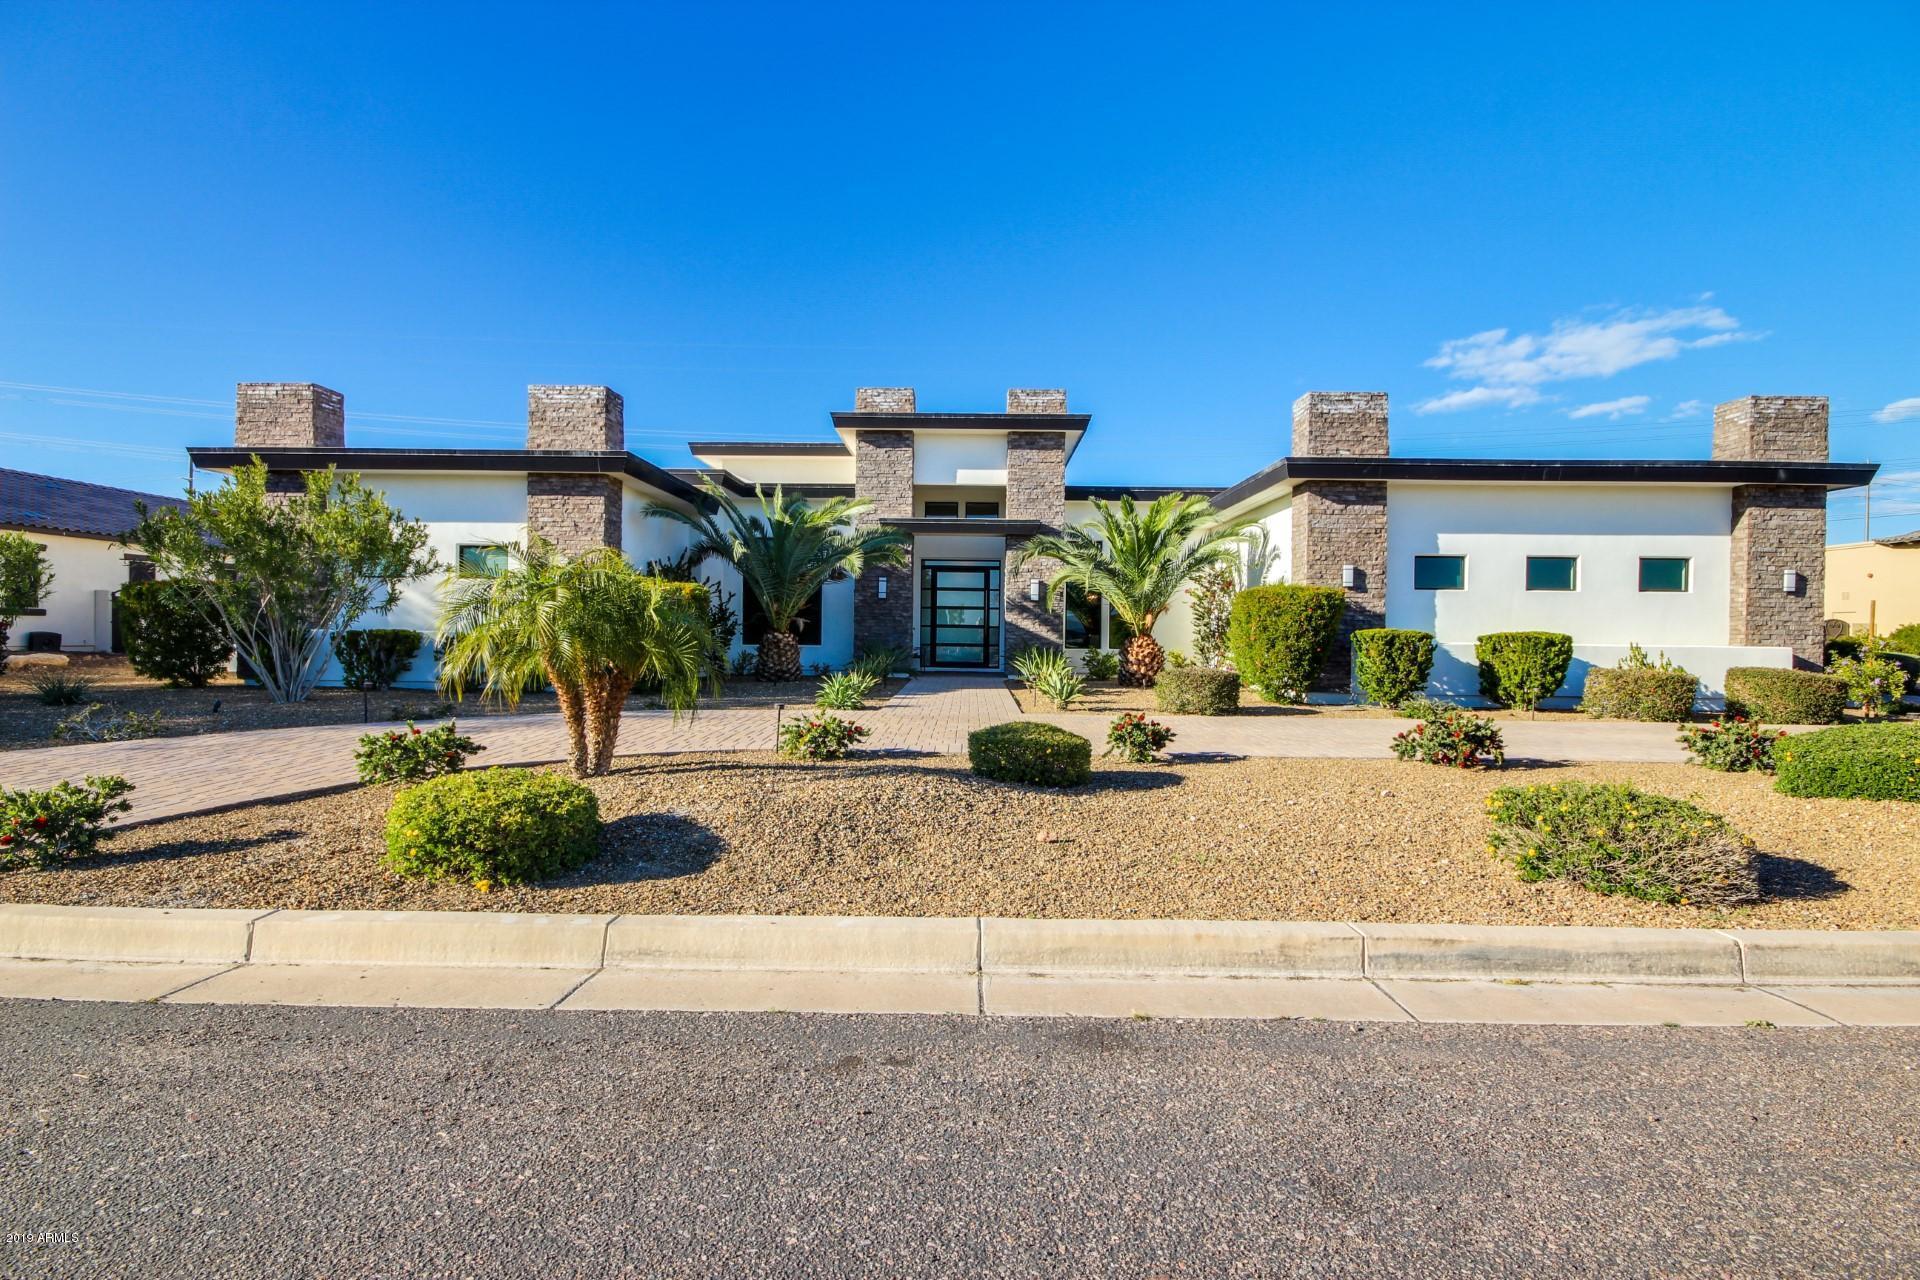 Photo of 9830 W JJ RANCH Road, Peoria, AZ 85383